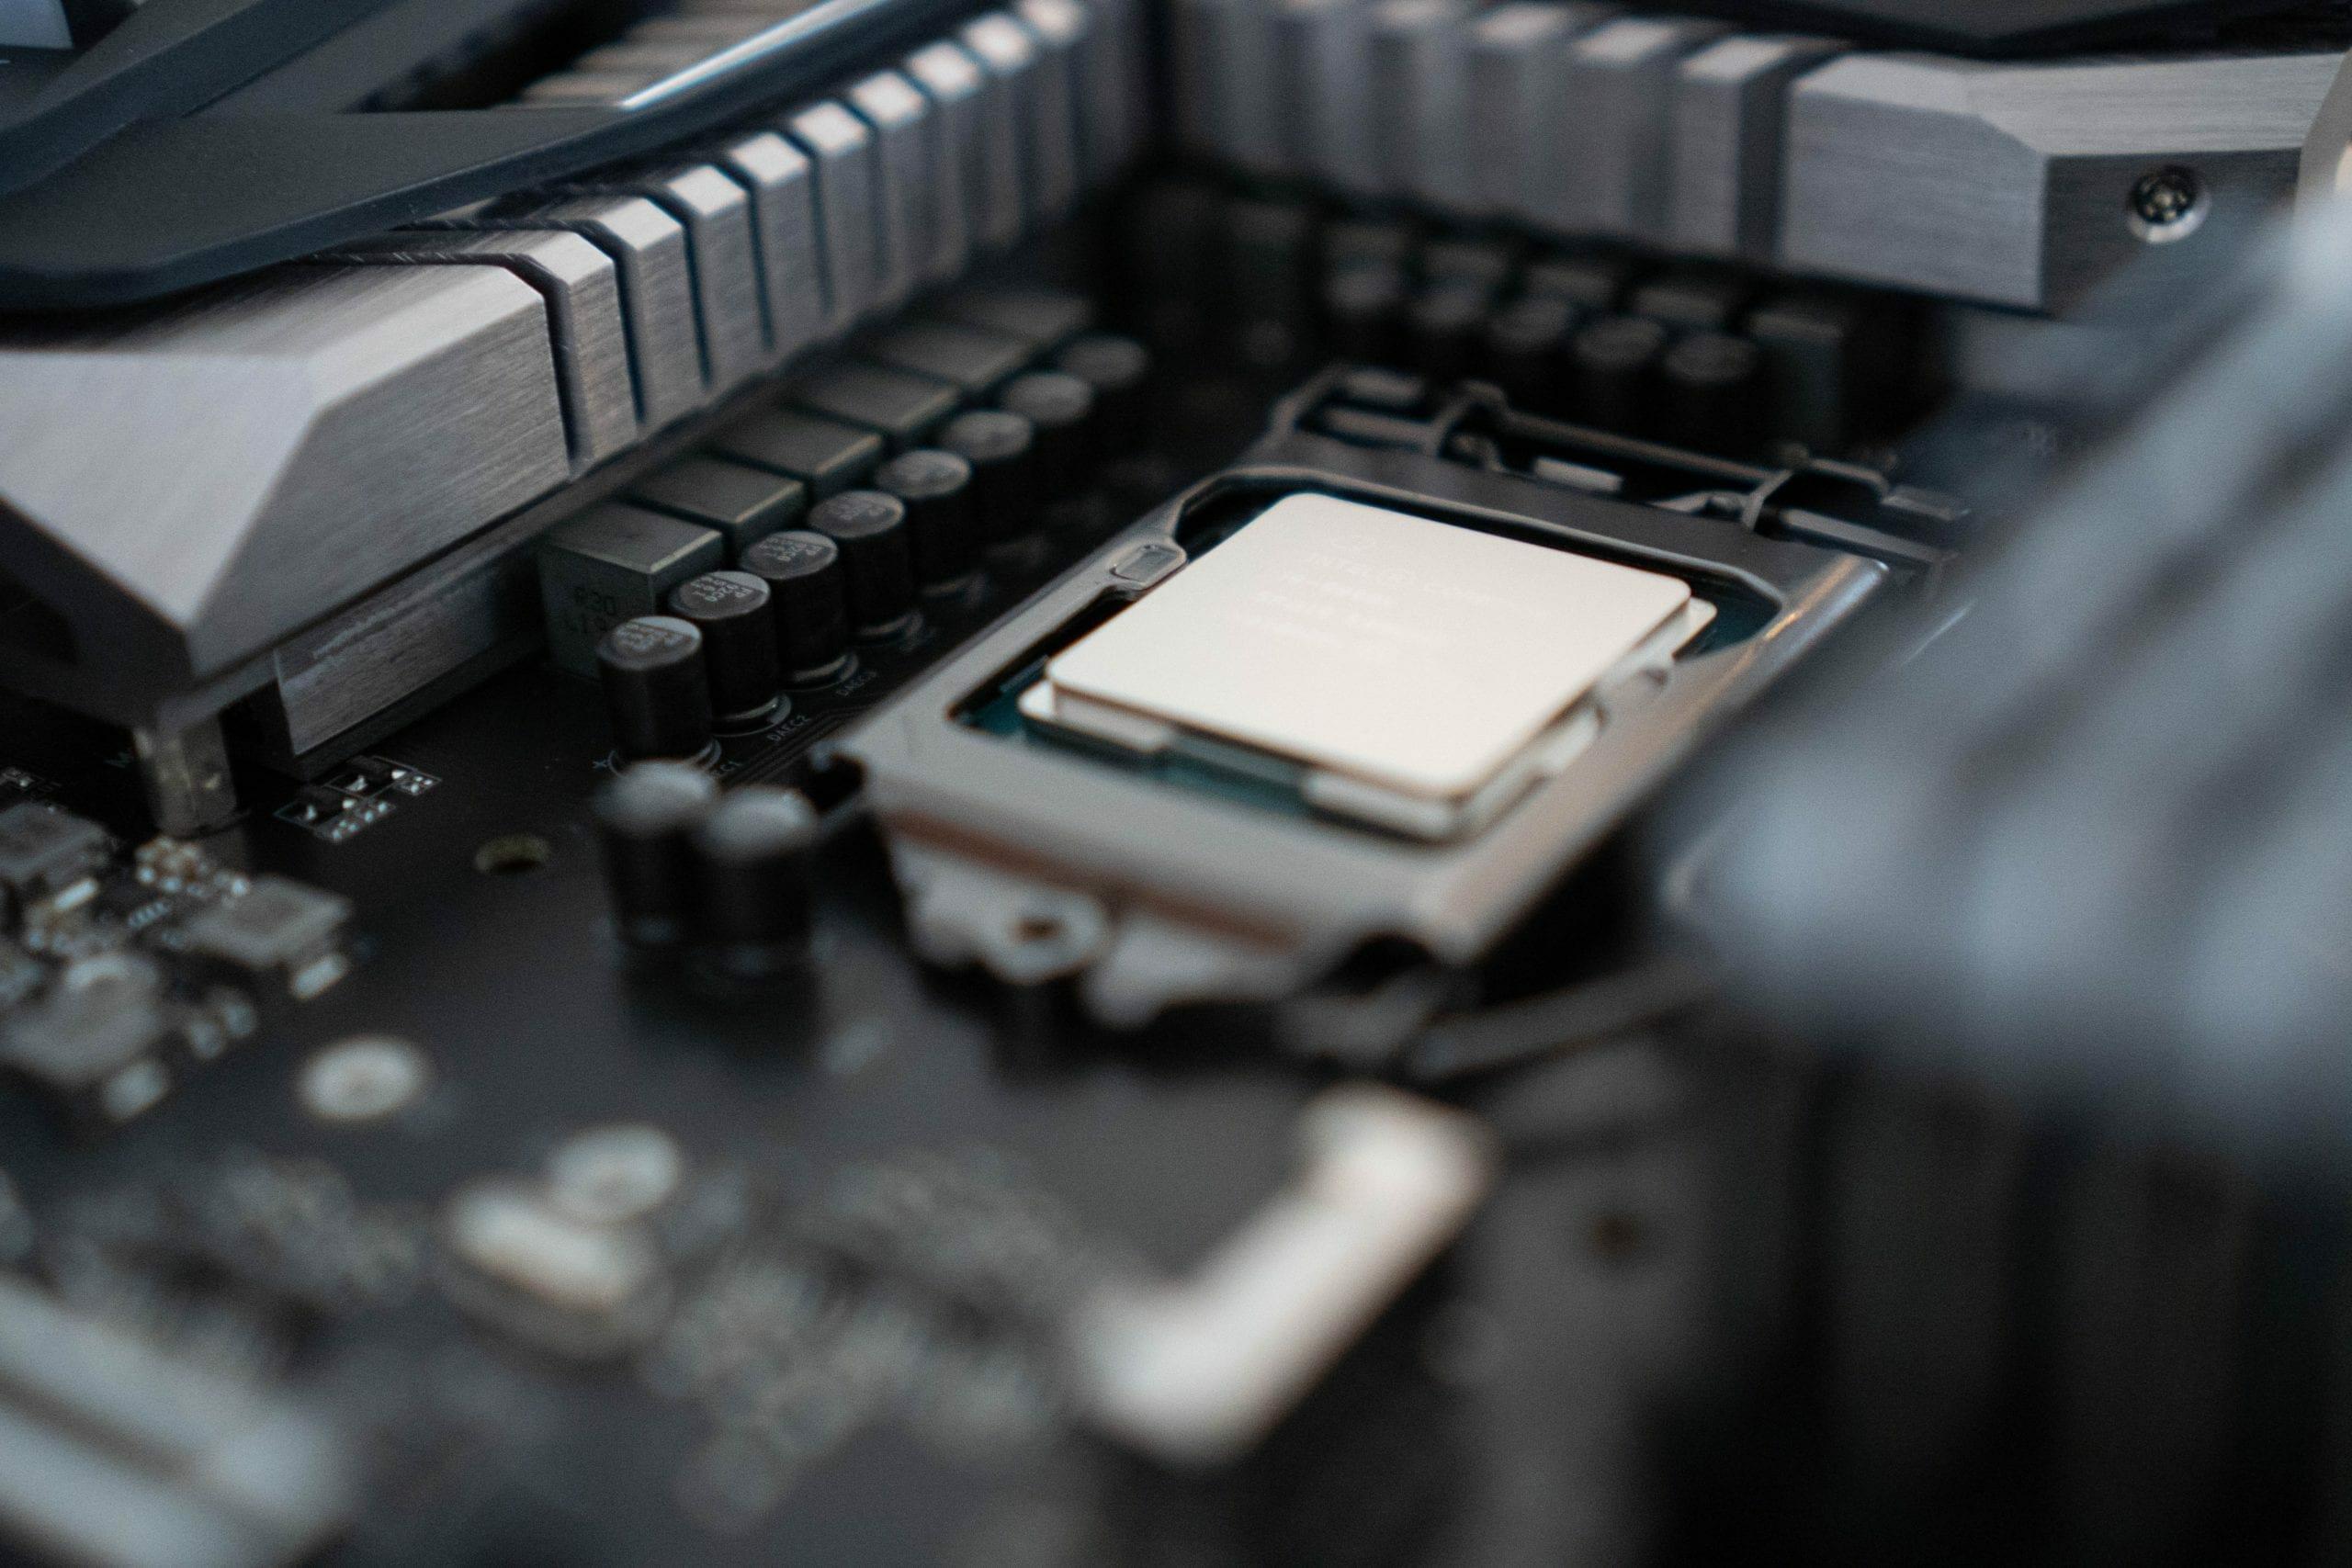 Intel Core i9-10850K (10C/20T)